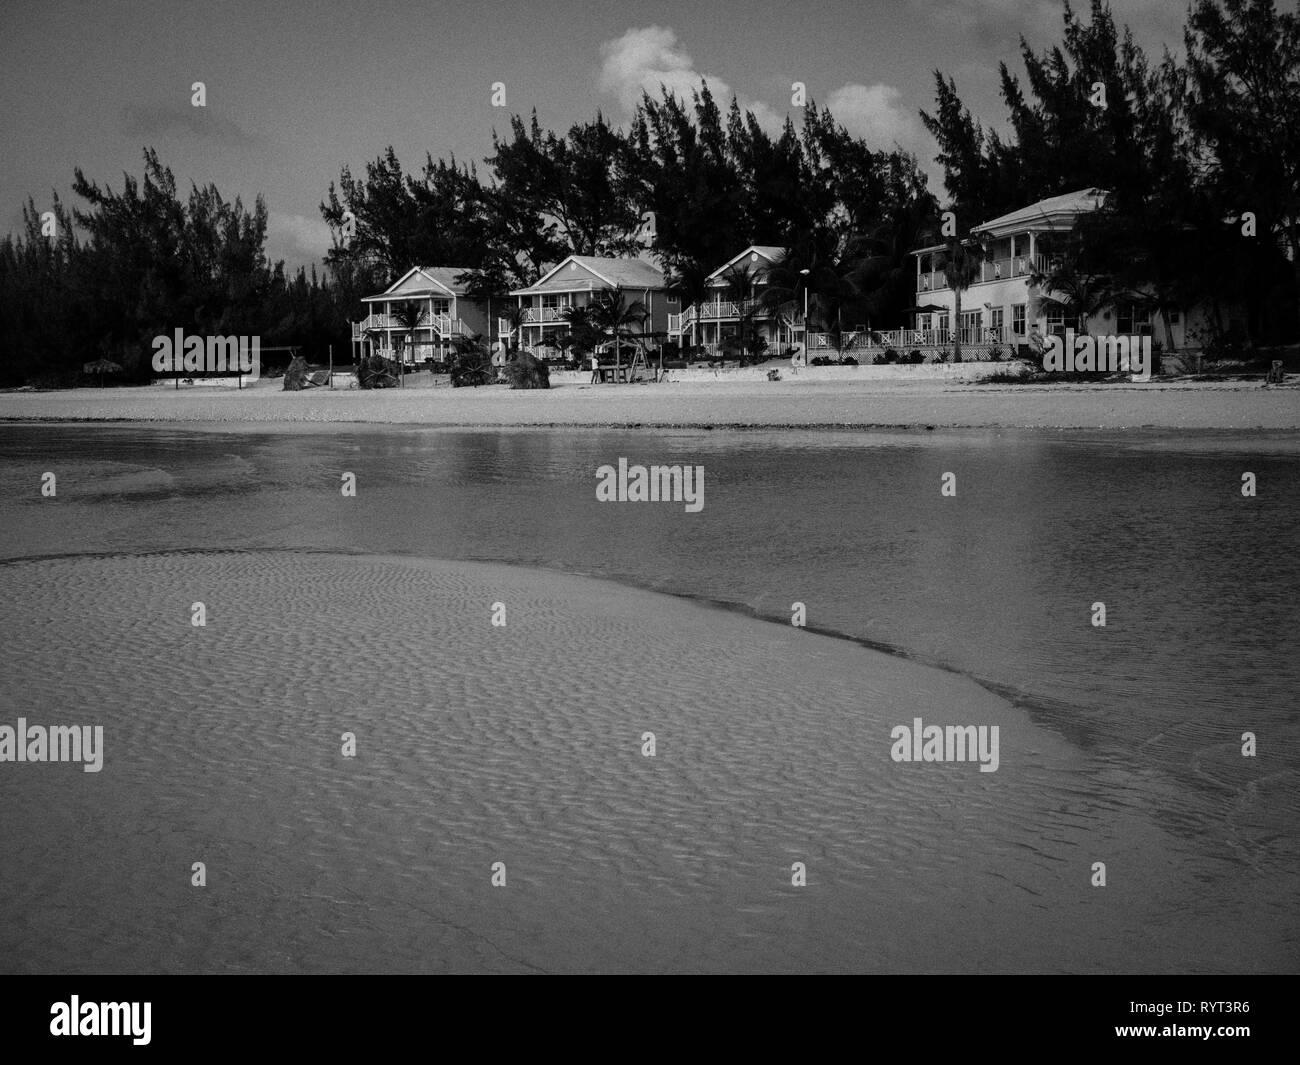 Black and White Landscape, Cocodimama Charming Resort, Governors Harbour, Eleuthera, The Bahamas. - Stock Image